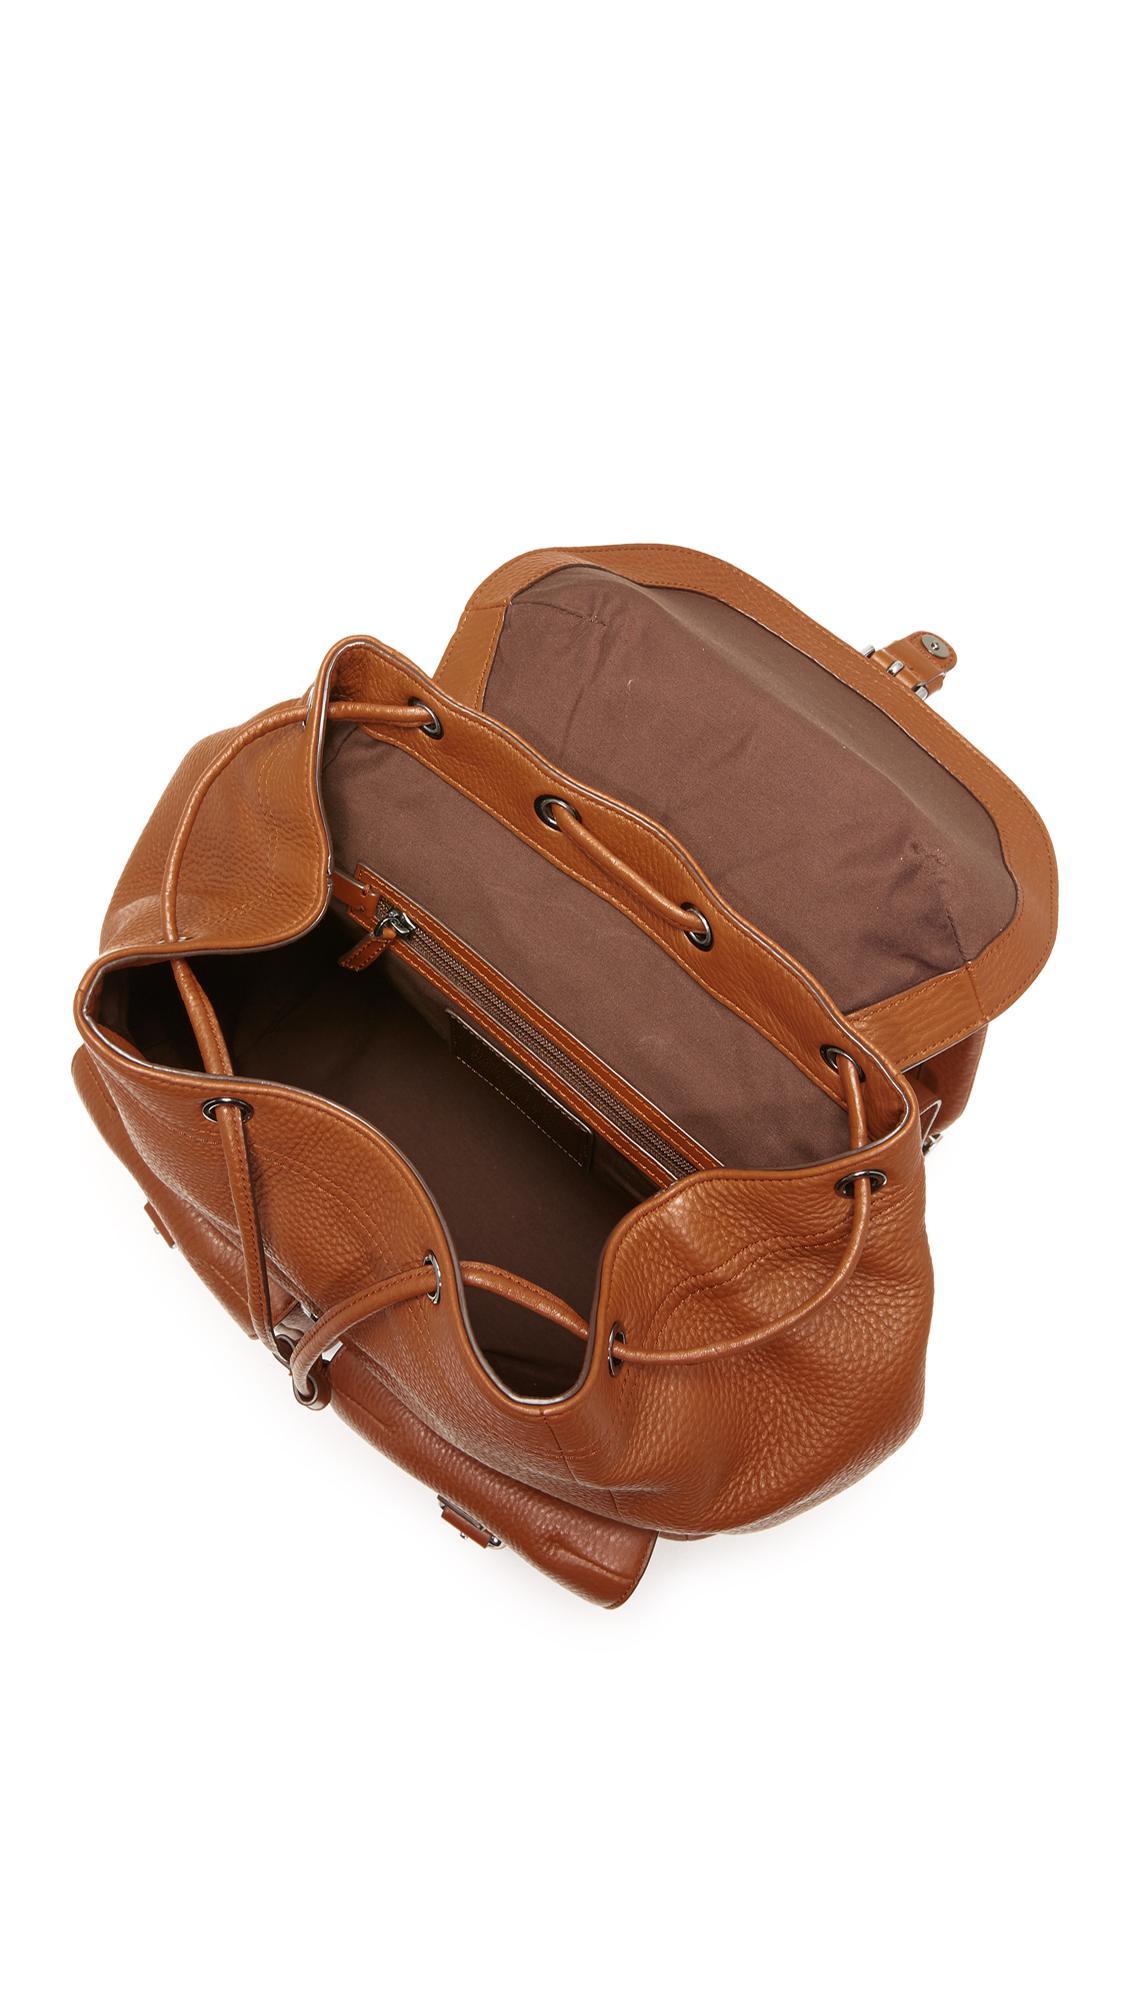 1ee2ad93019f Lyst - Michael Kors Bryant Drawstring Backpack in Brown for Men